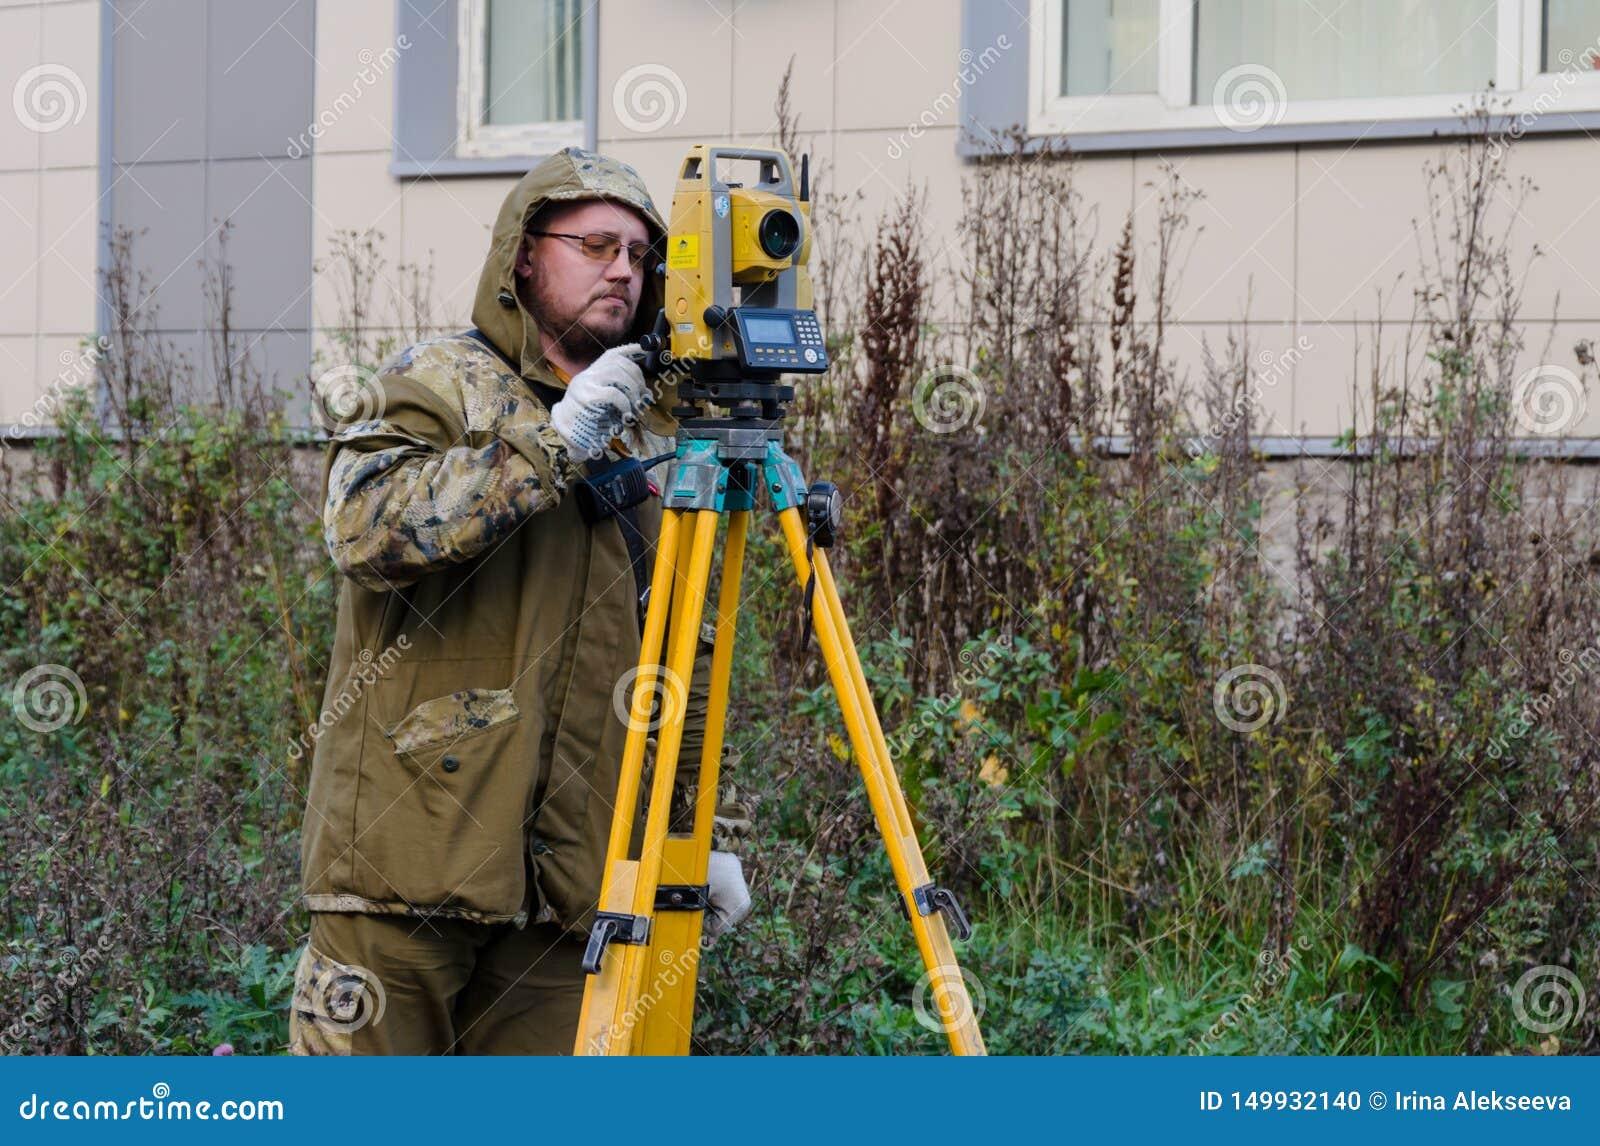 St. Petersburg,Russia-October 23,2018 -surveyor worker with theodolite